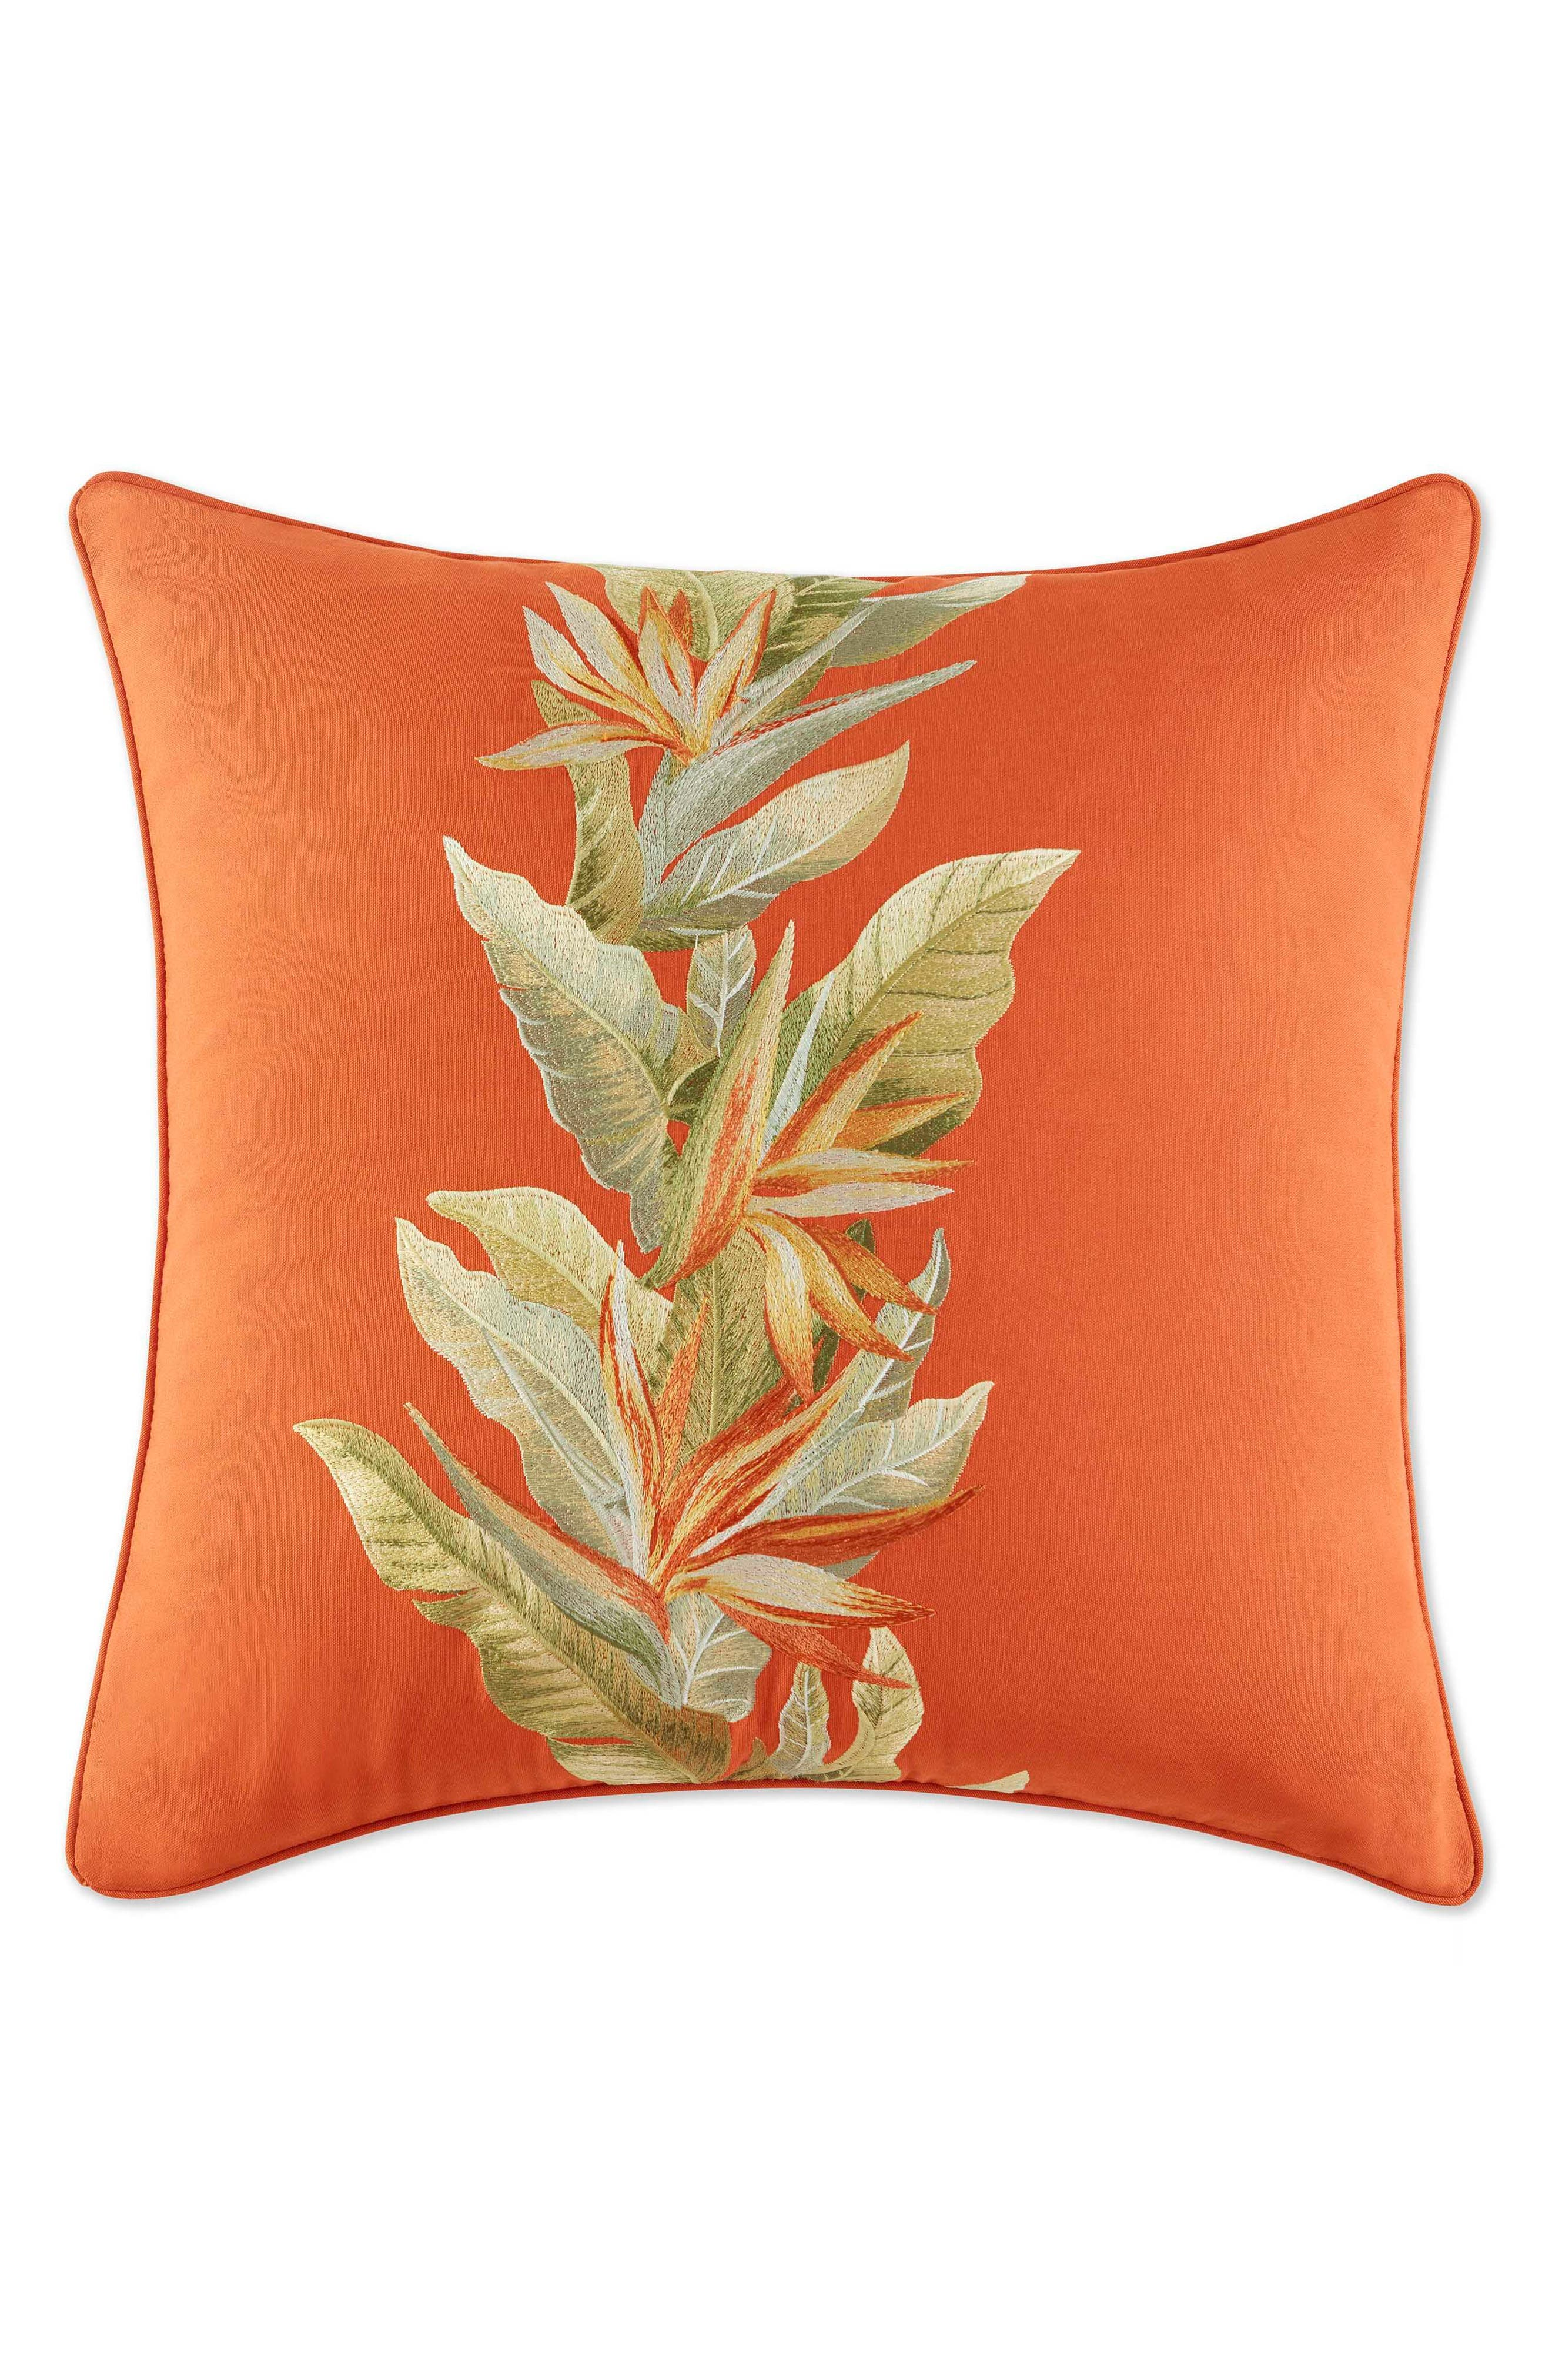 Birds of Paradise Accent Pillow,                             Main thumbnail 1, color,                             Spice